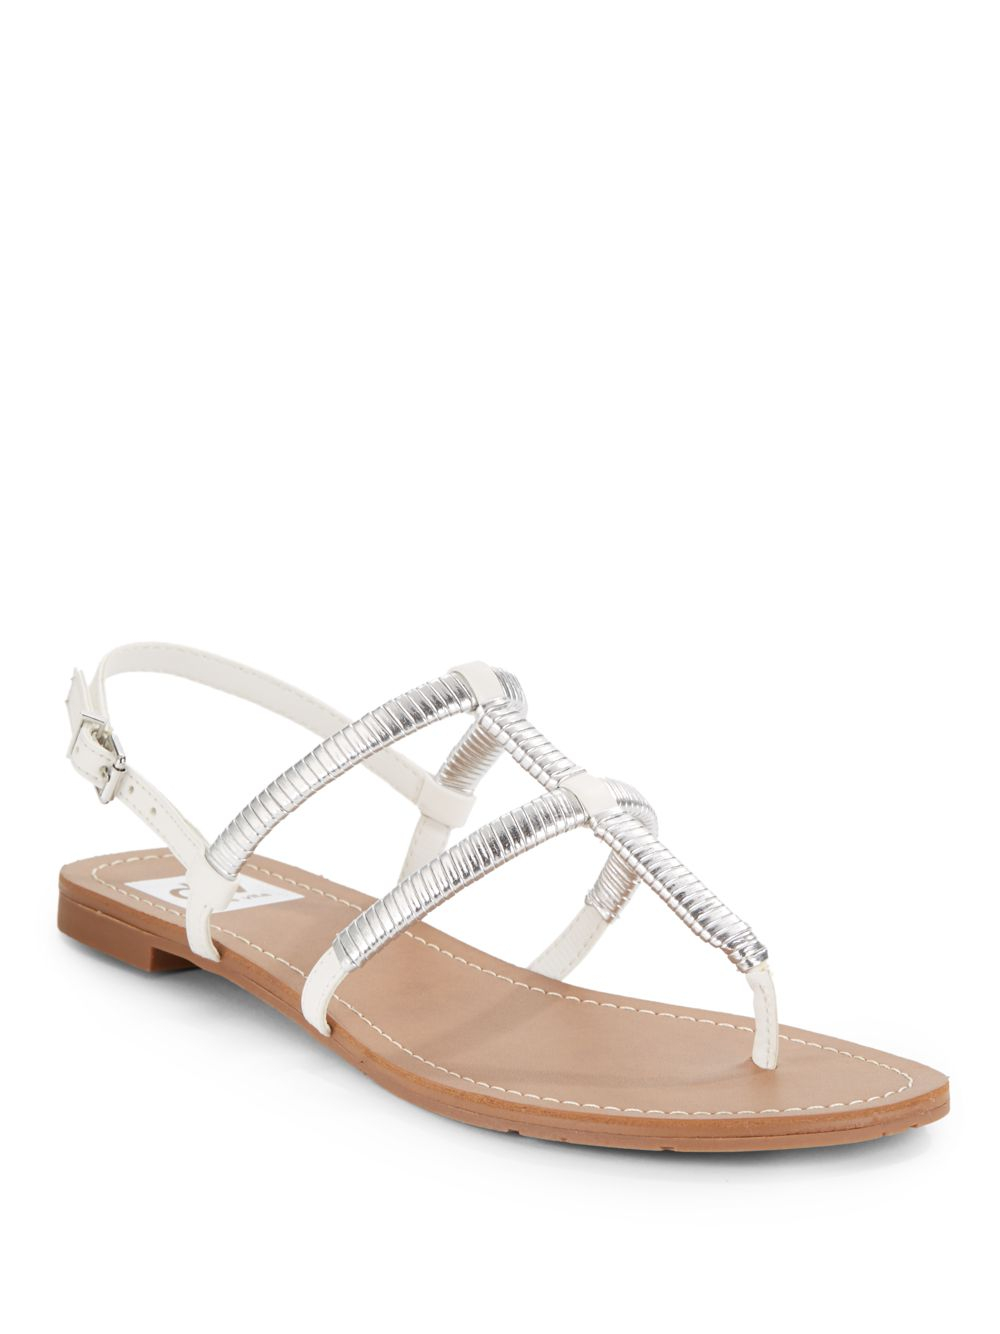 220b90a2d1ef49 Lyst - Dv By Dolce Vita Gava Silver Metallic-Trimmed Flat Sandals in ...